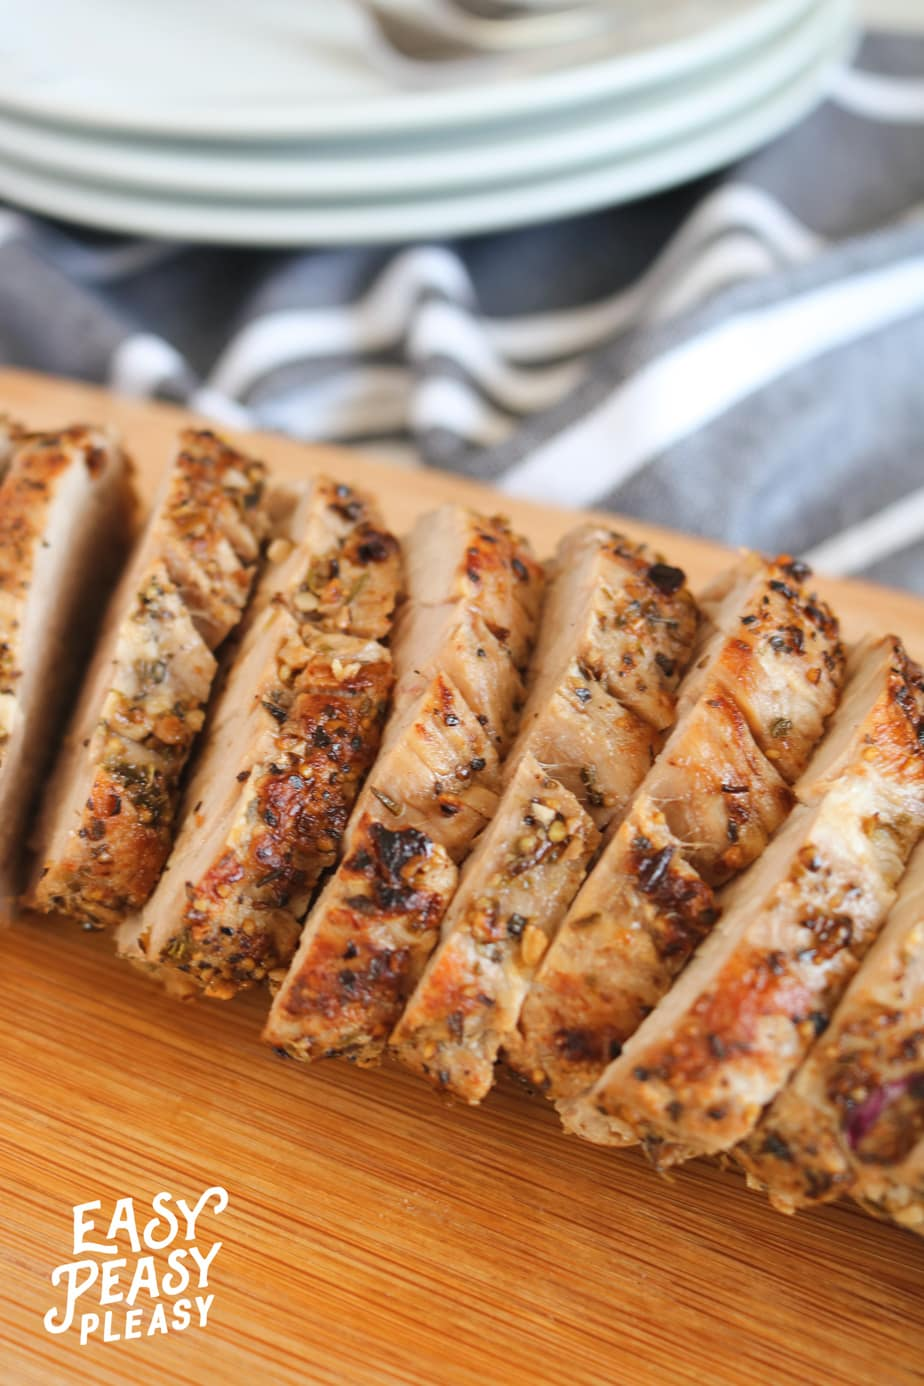 Inexpensive Juicy Pork Tenderloin Recipe from Easy Peasy Pleasy.